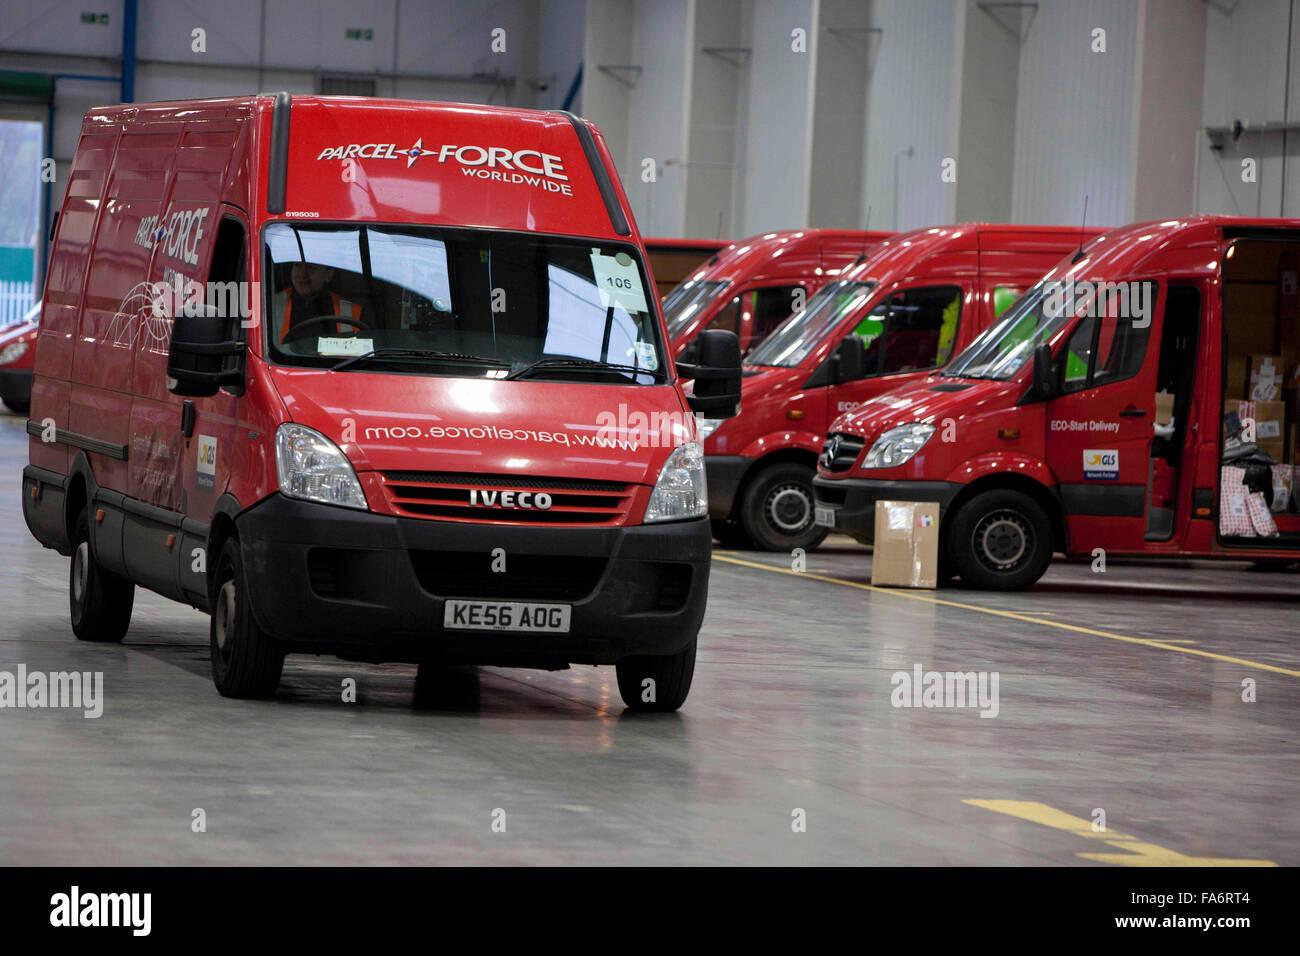 Parcelforce vans , Stoke depot - Stock Image